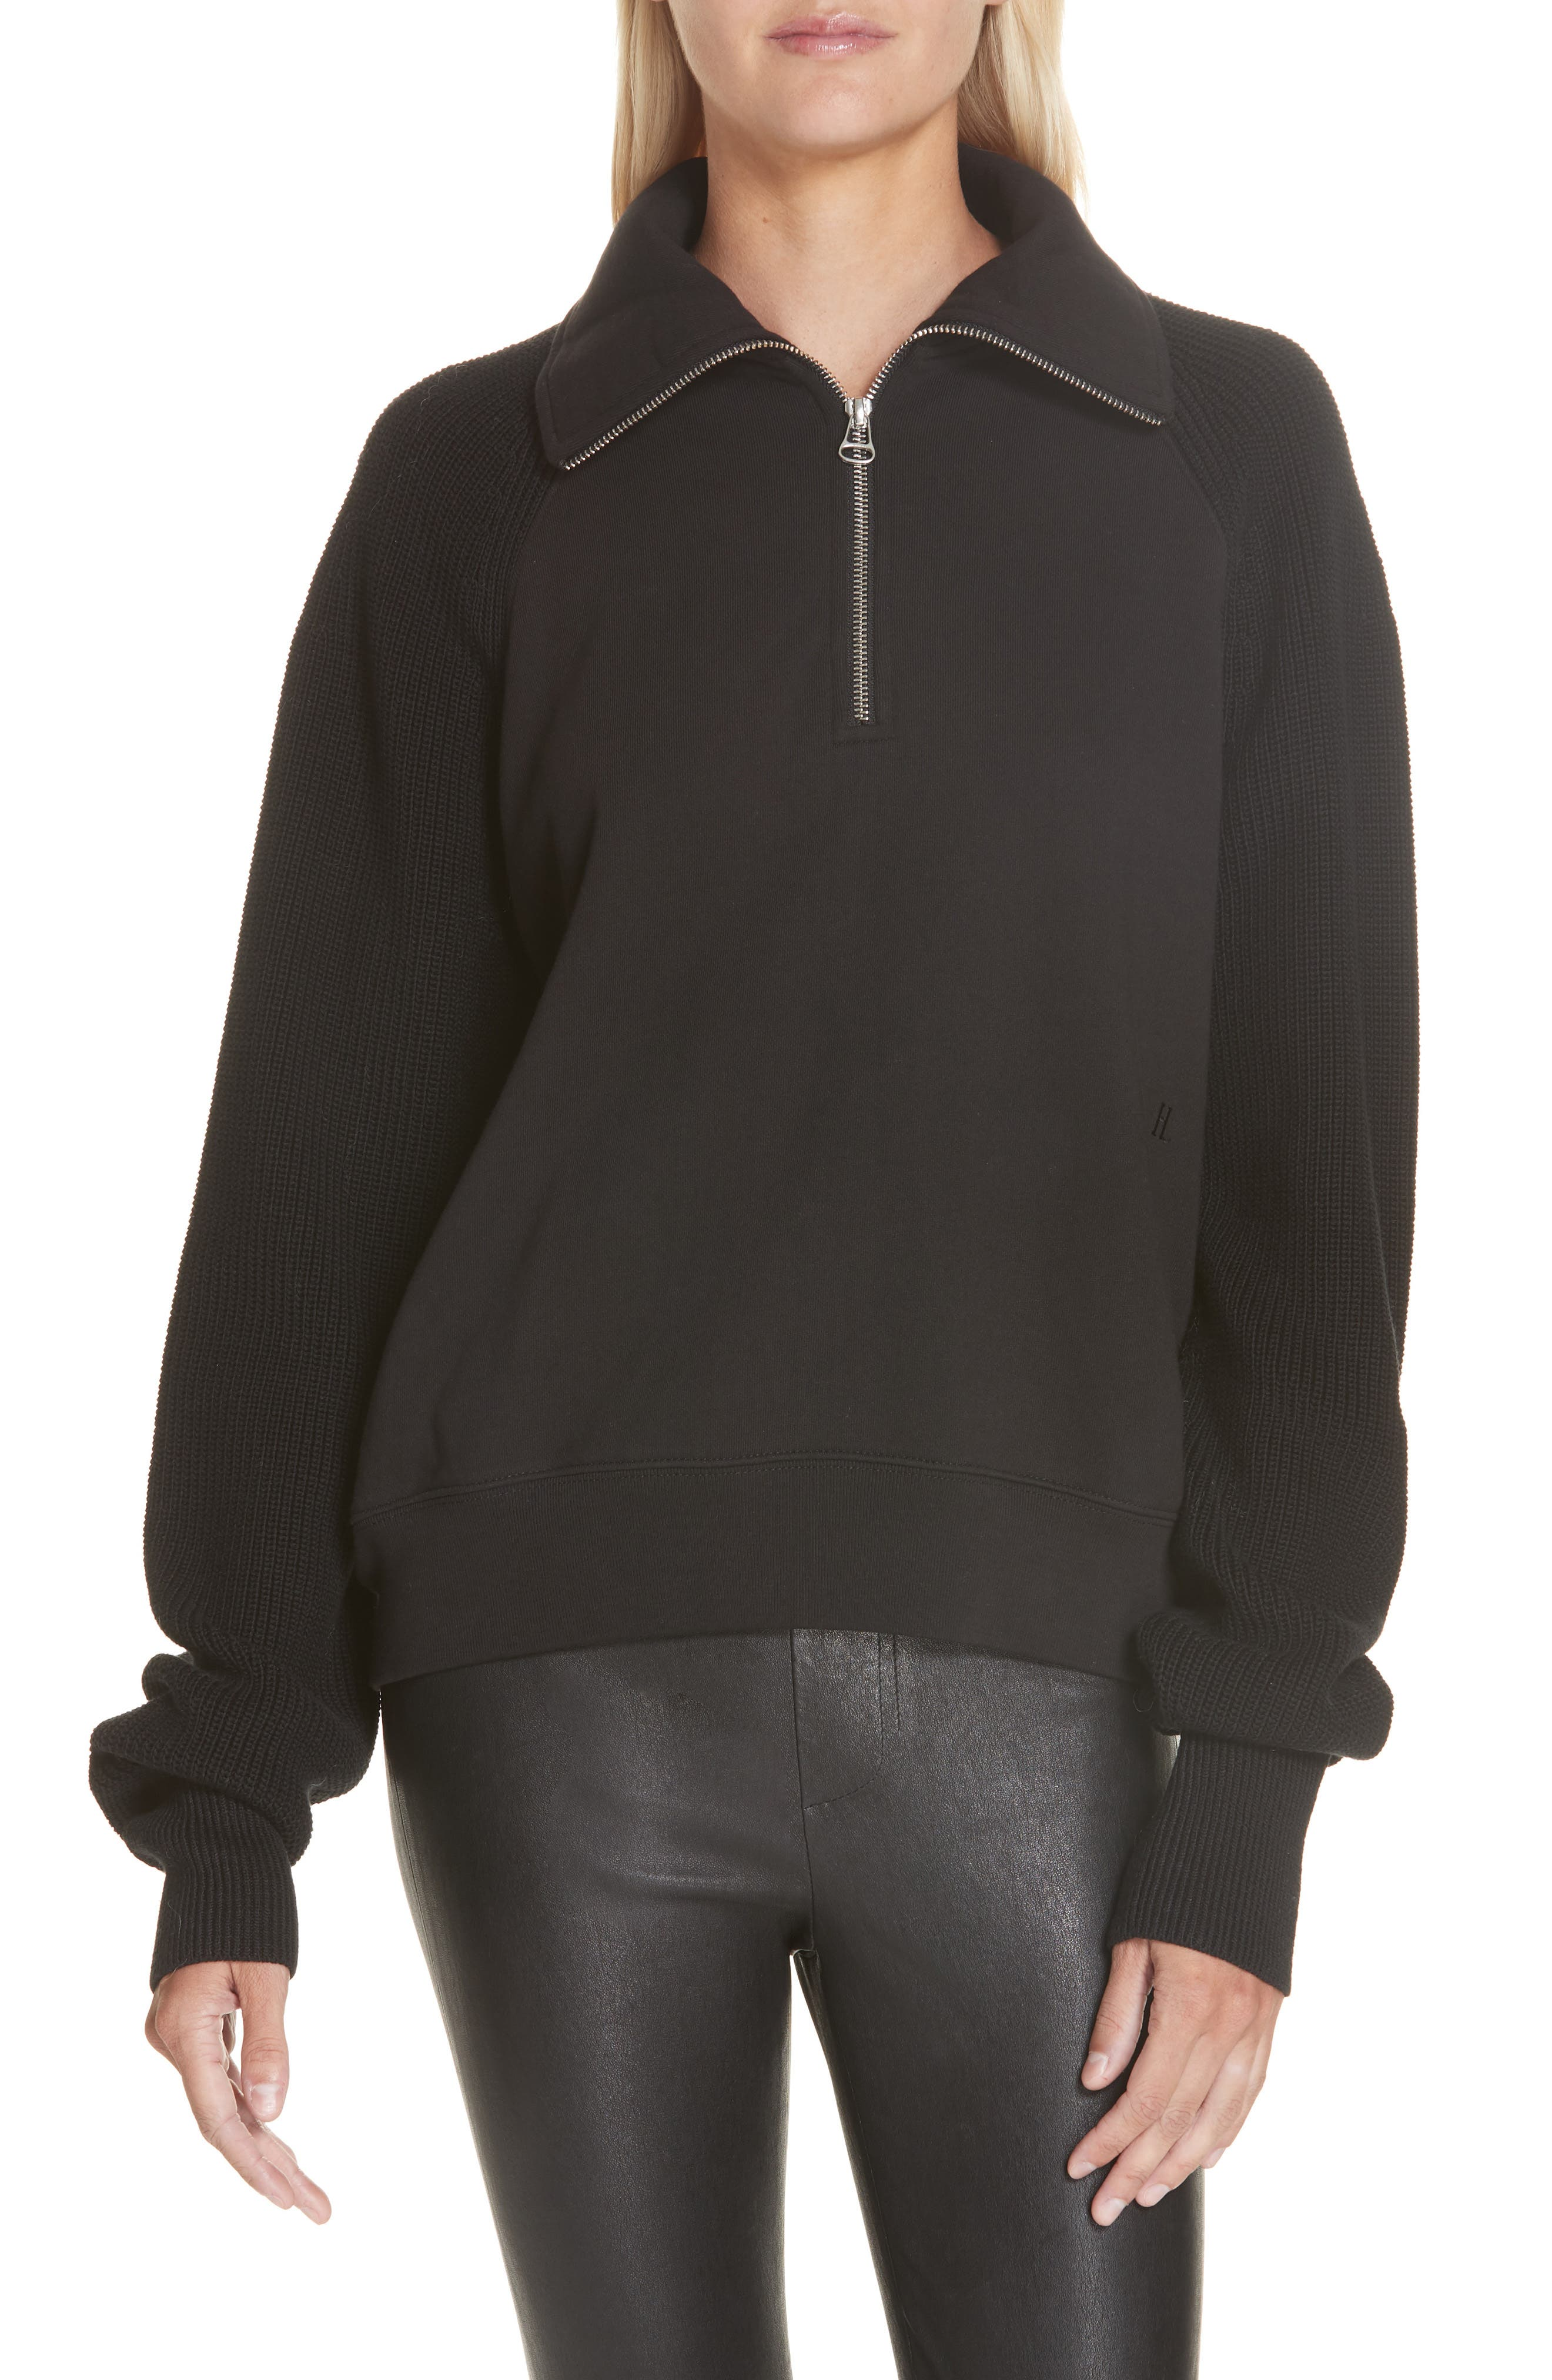 Helmut Lang Contrast Sleeve Quarter Zip Sweatshirt, Black